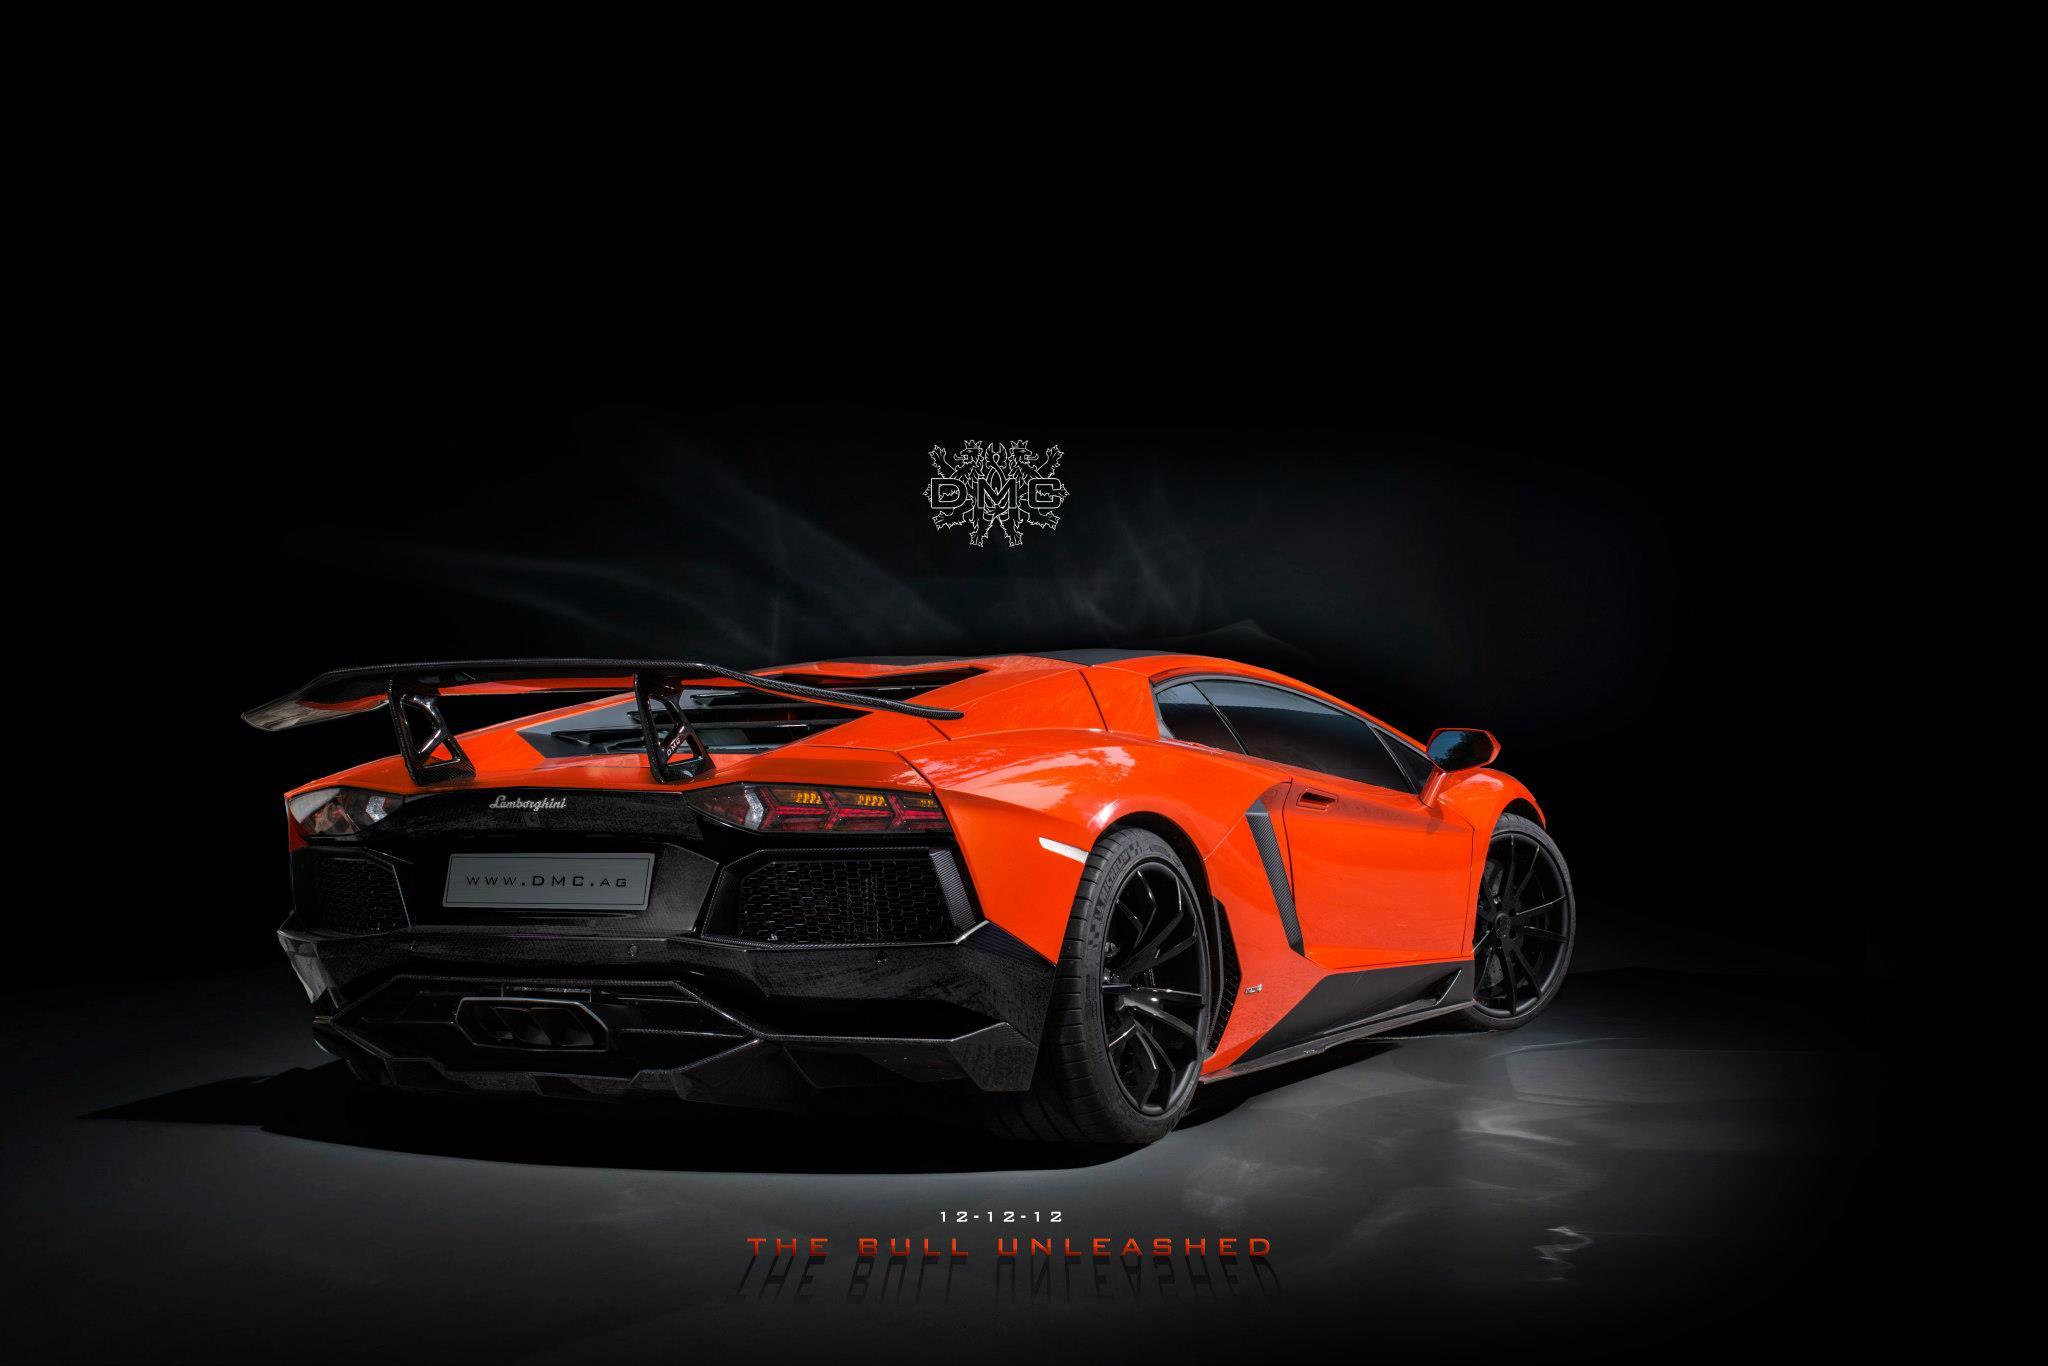 2012 Dmc Lamborghini Aventador Lp900sv Supercar Supercars